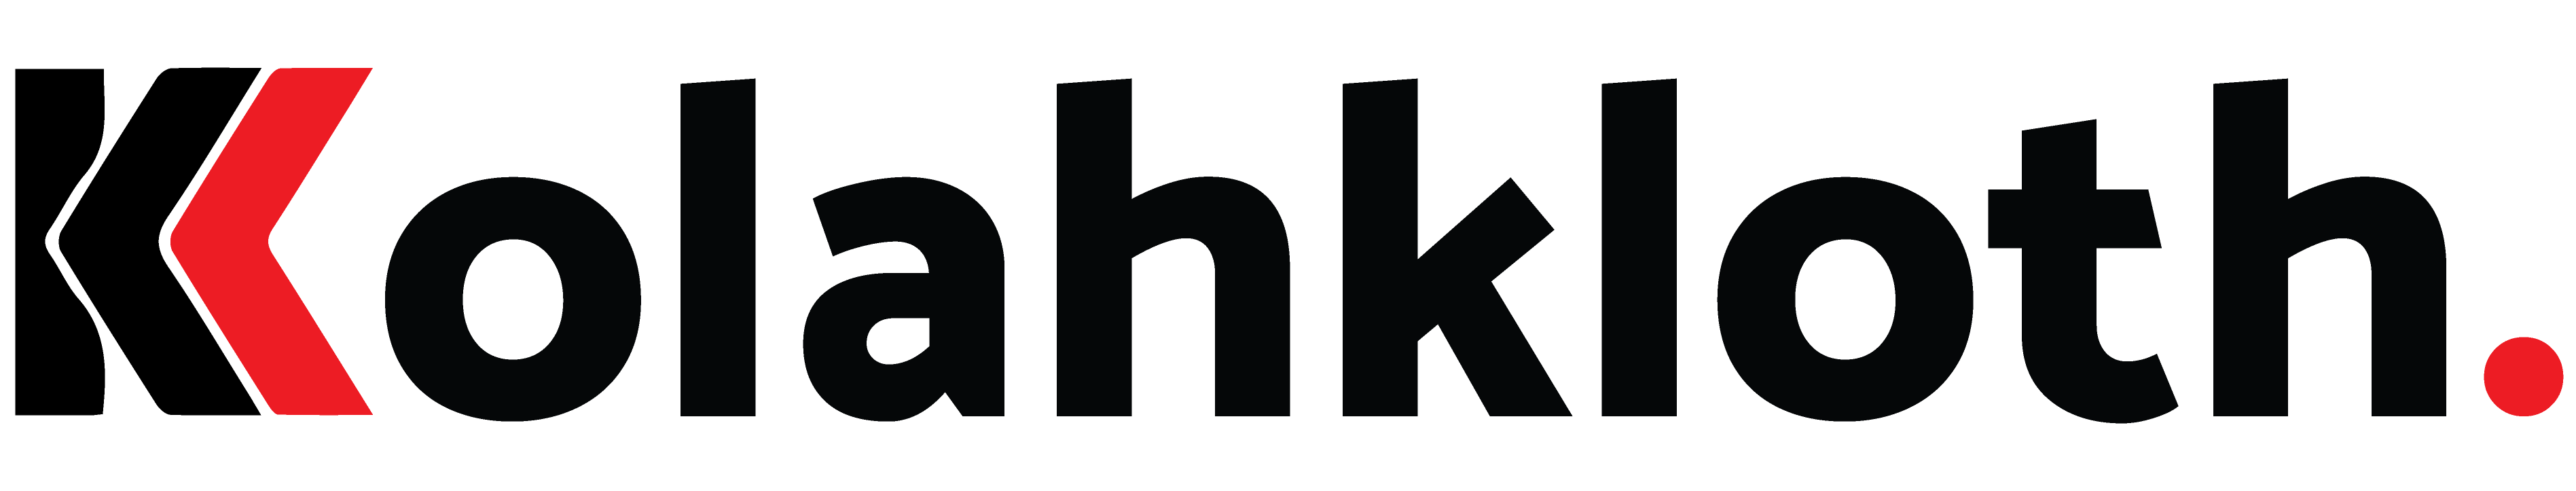 www.kolahkloth.com